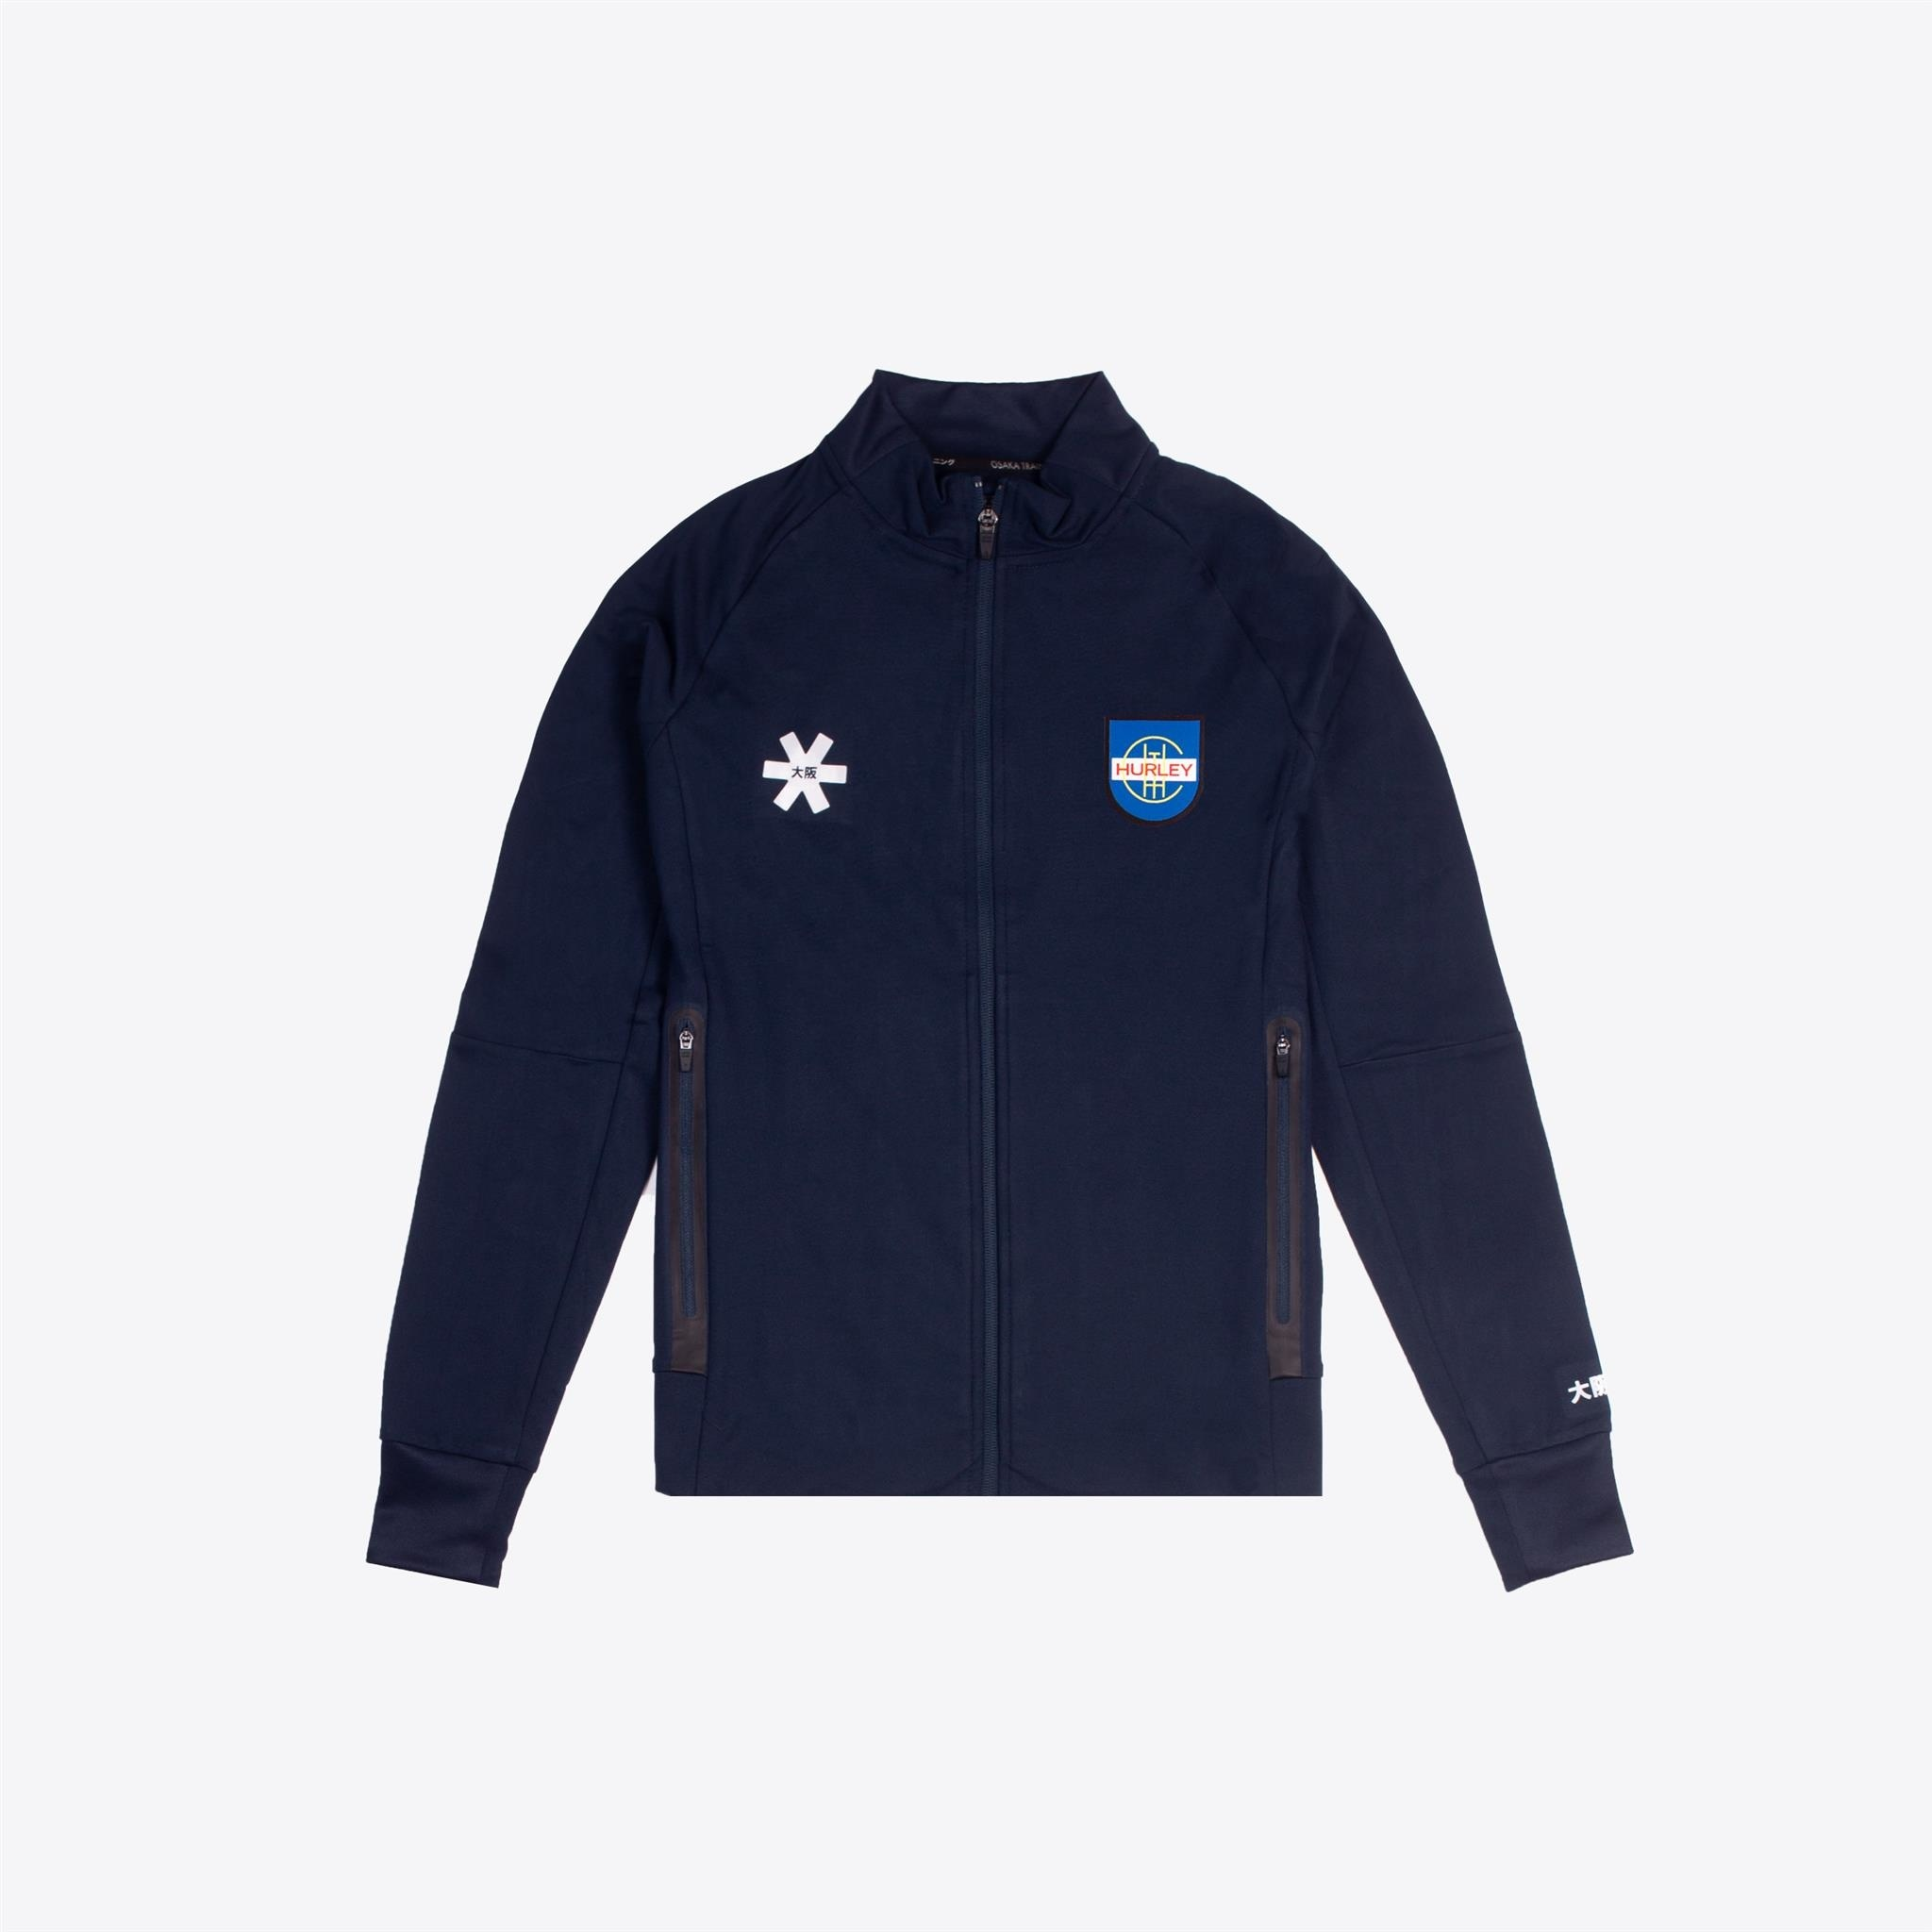 Hurley track jacket Men